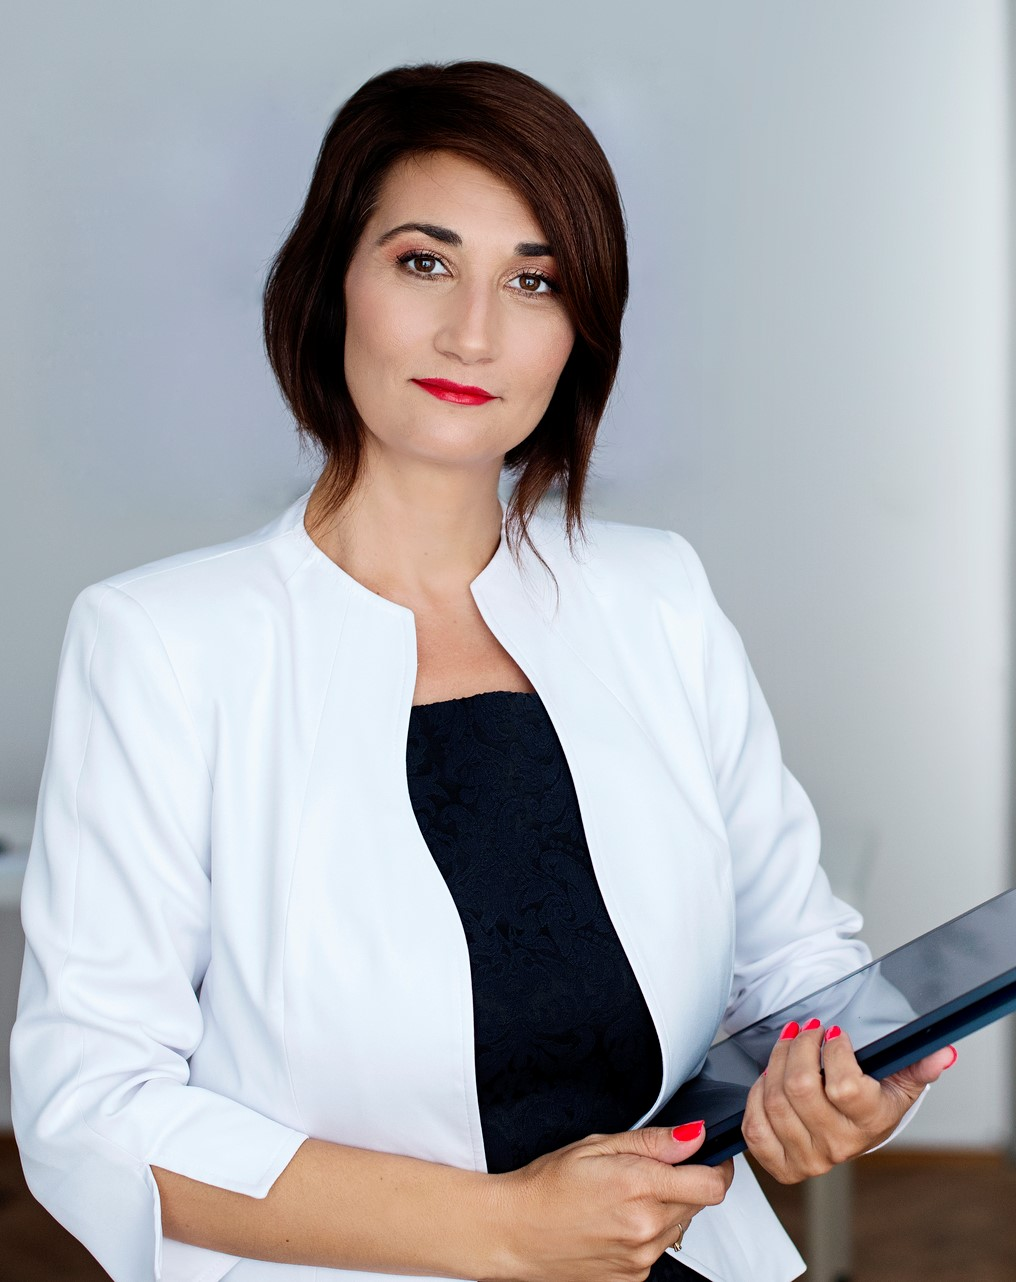 Dr. Galia Mancheva